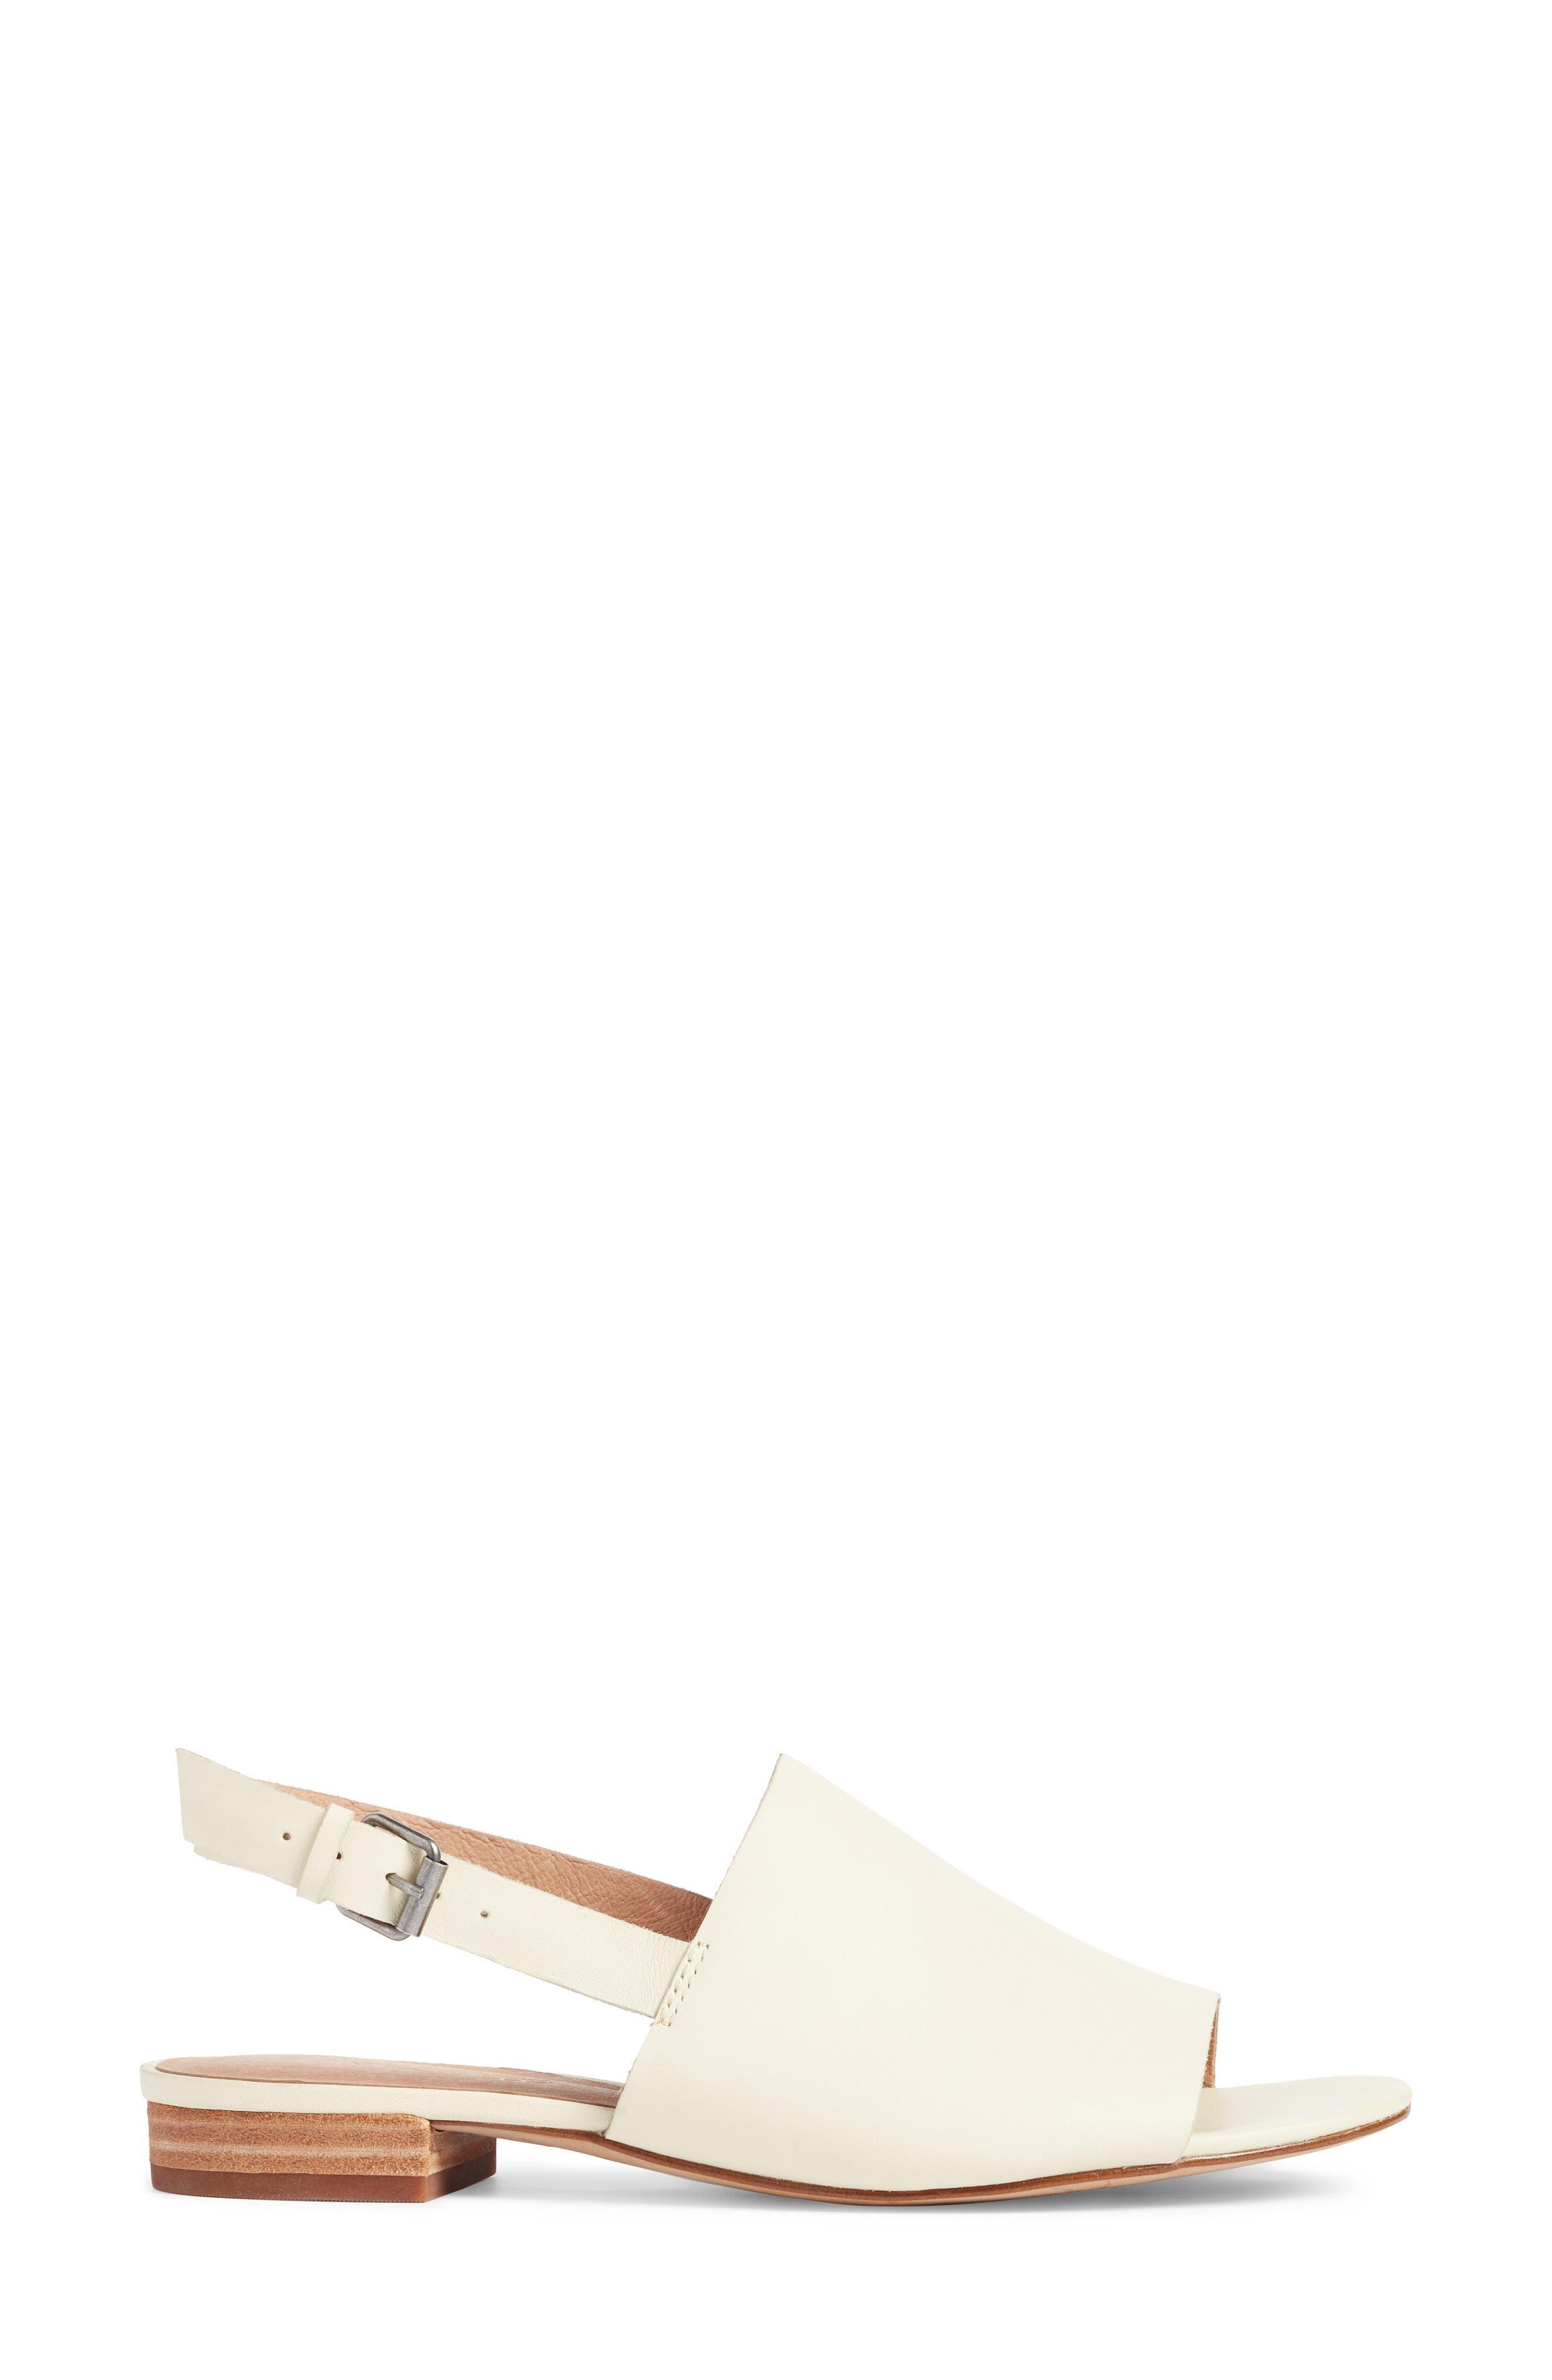 Noelle Slingback Sandal,                             Alternate thumbnail 3, color,                             Vintage Canvas Leather